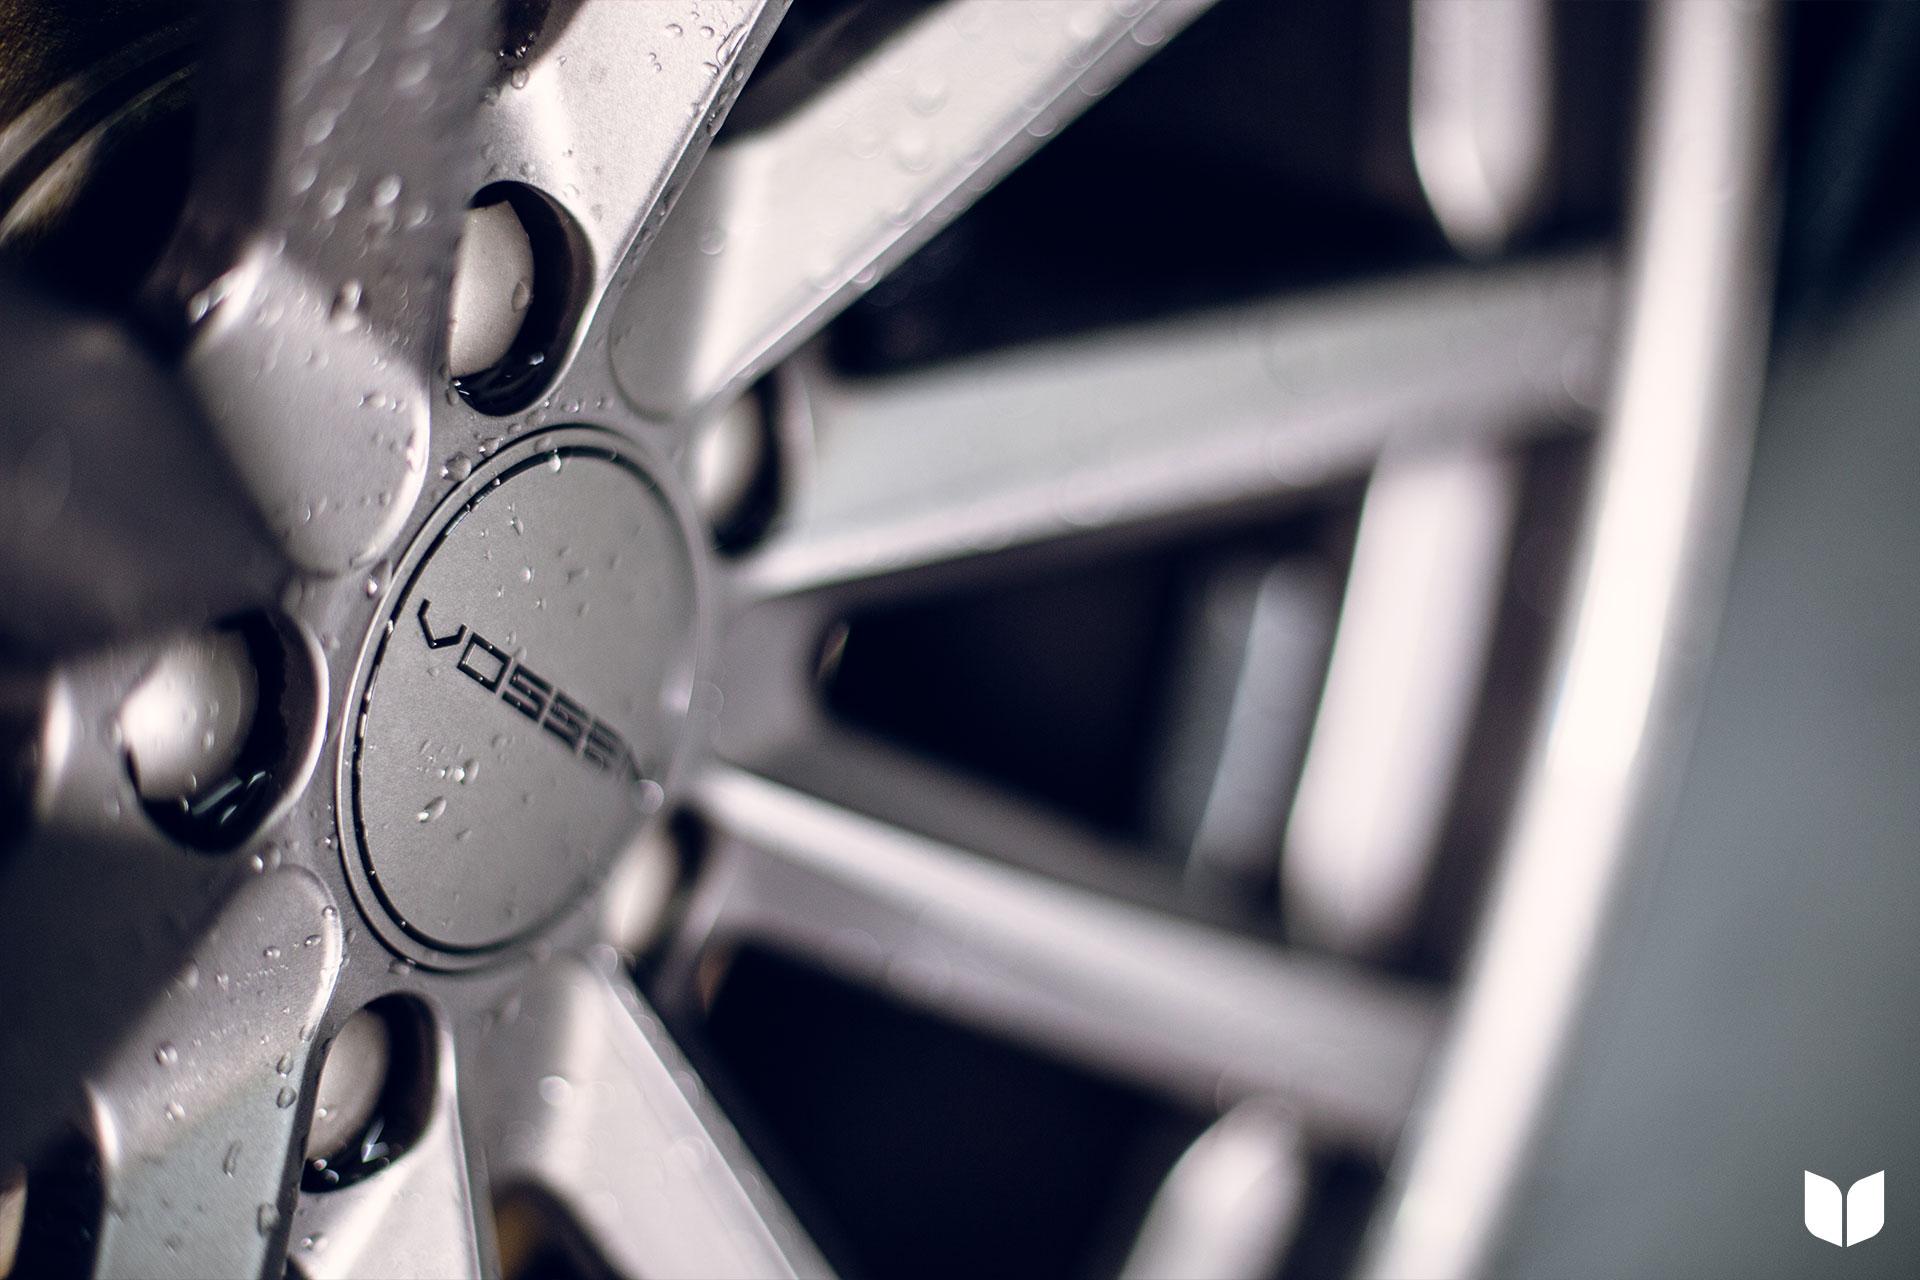 Vossen CV1 Monoblock Wheels 20 x 10.5 in